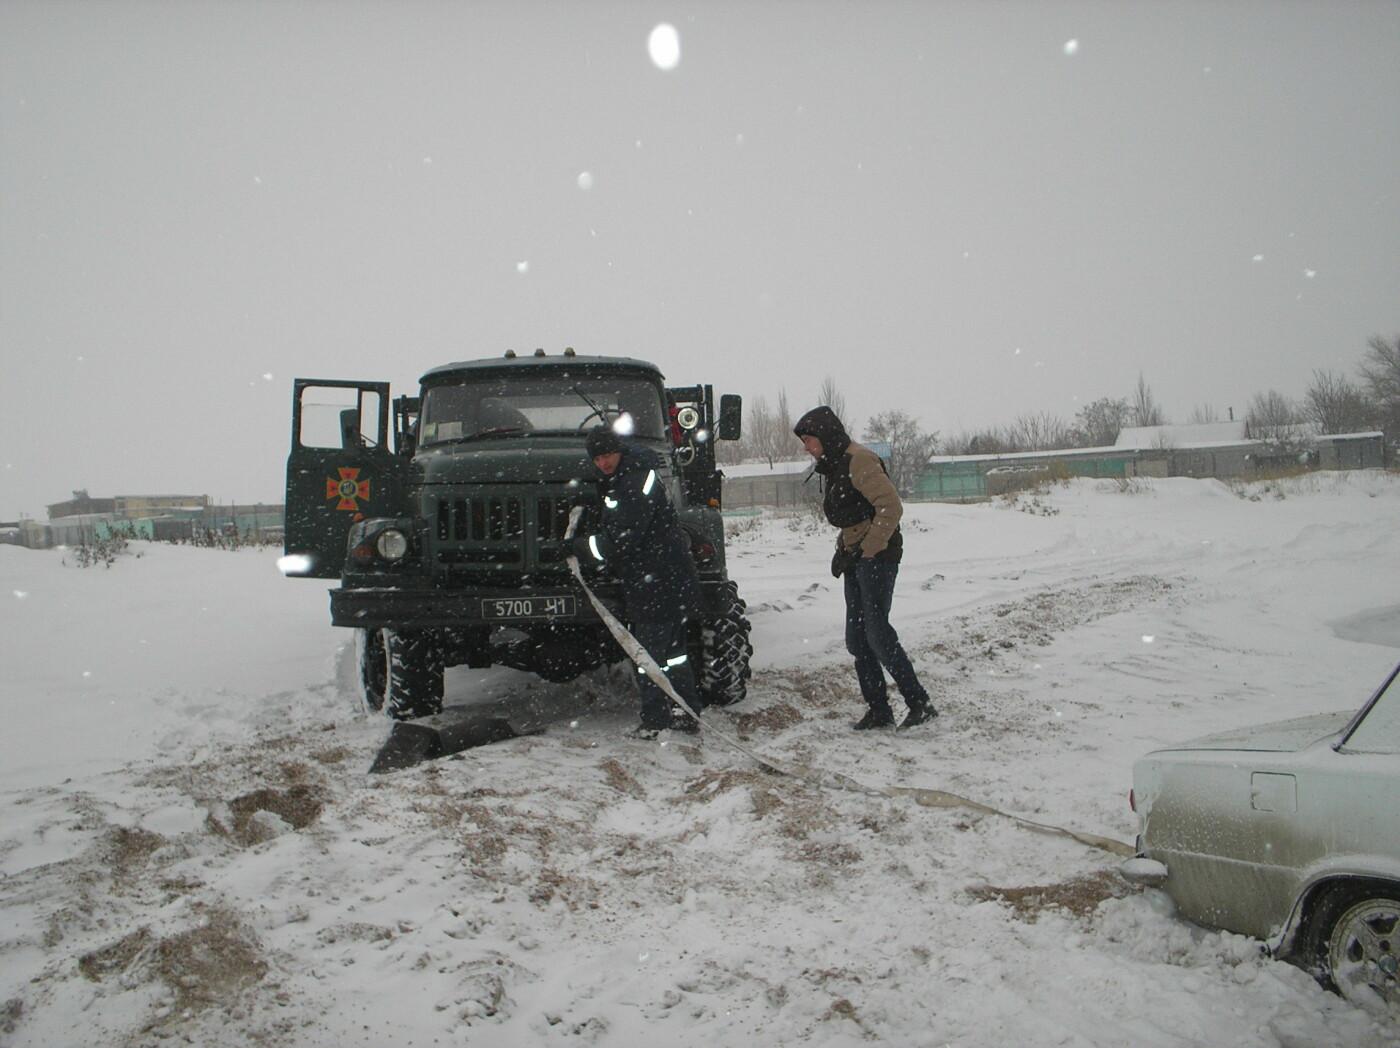 В Запорожской области машина застряла в песке и снегу: доставали спасатели, - ФОТО, фото-2